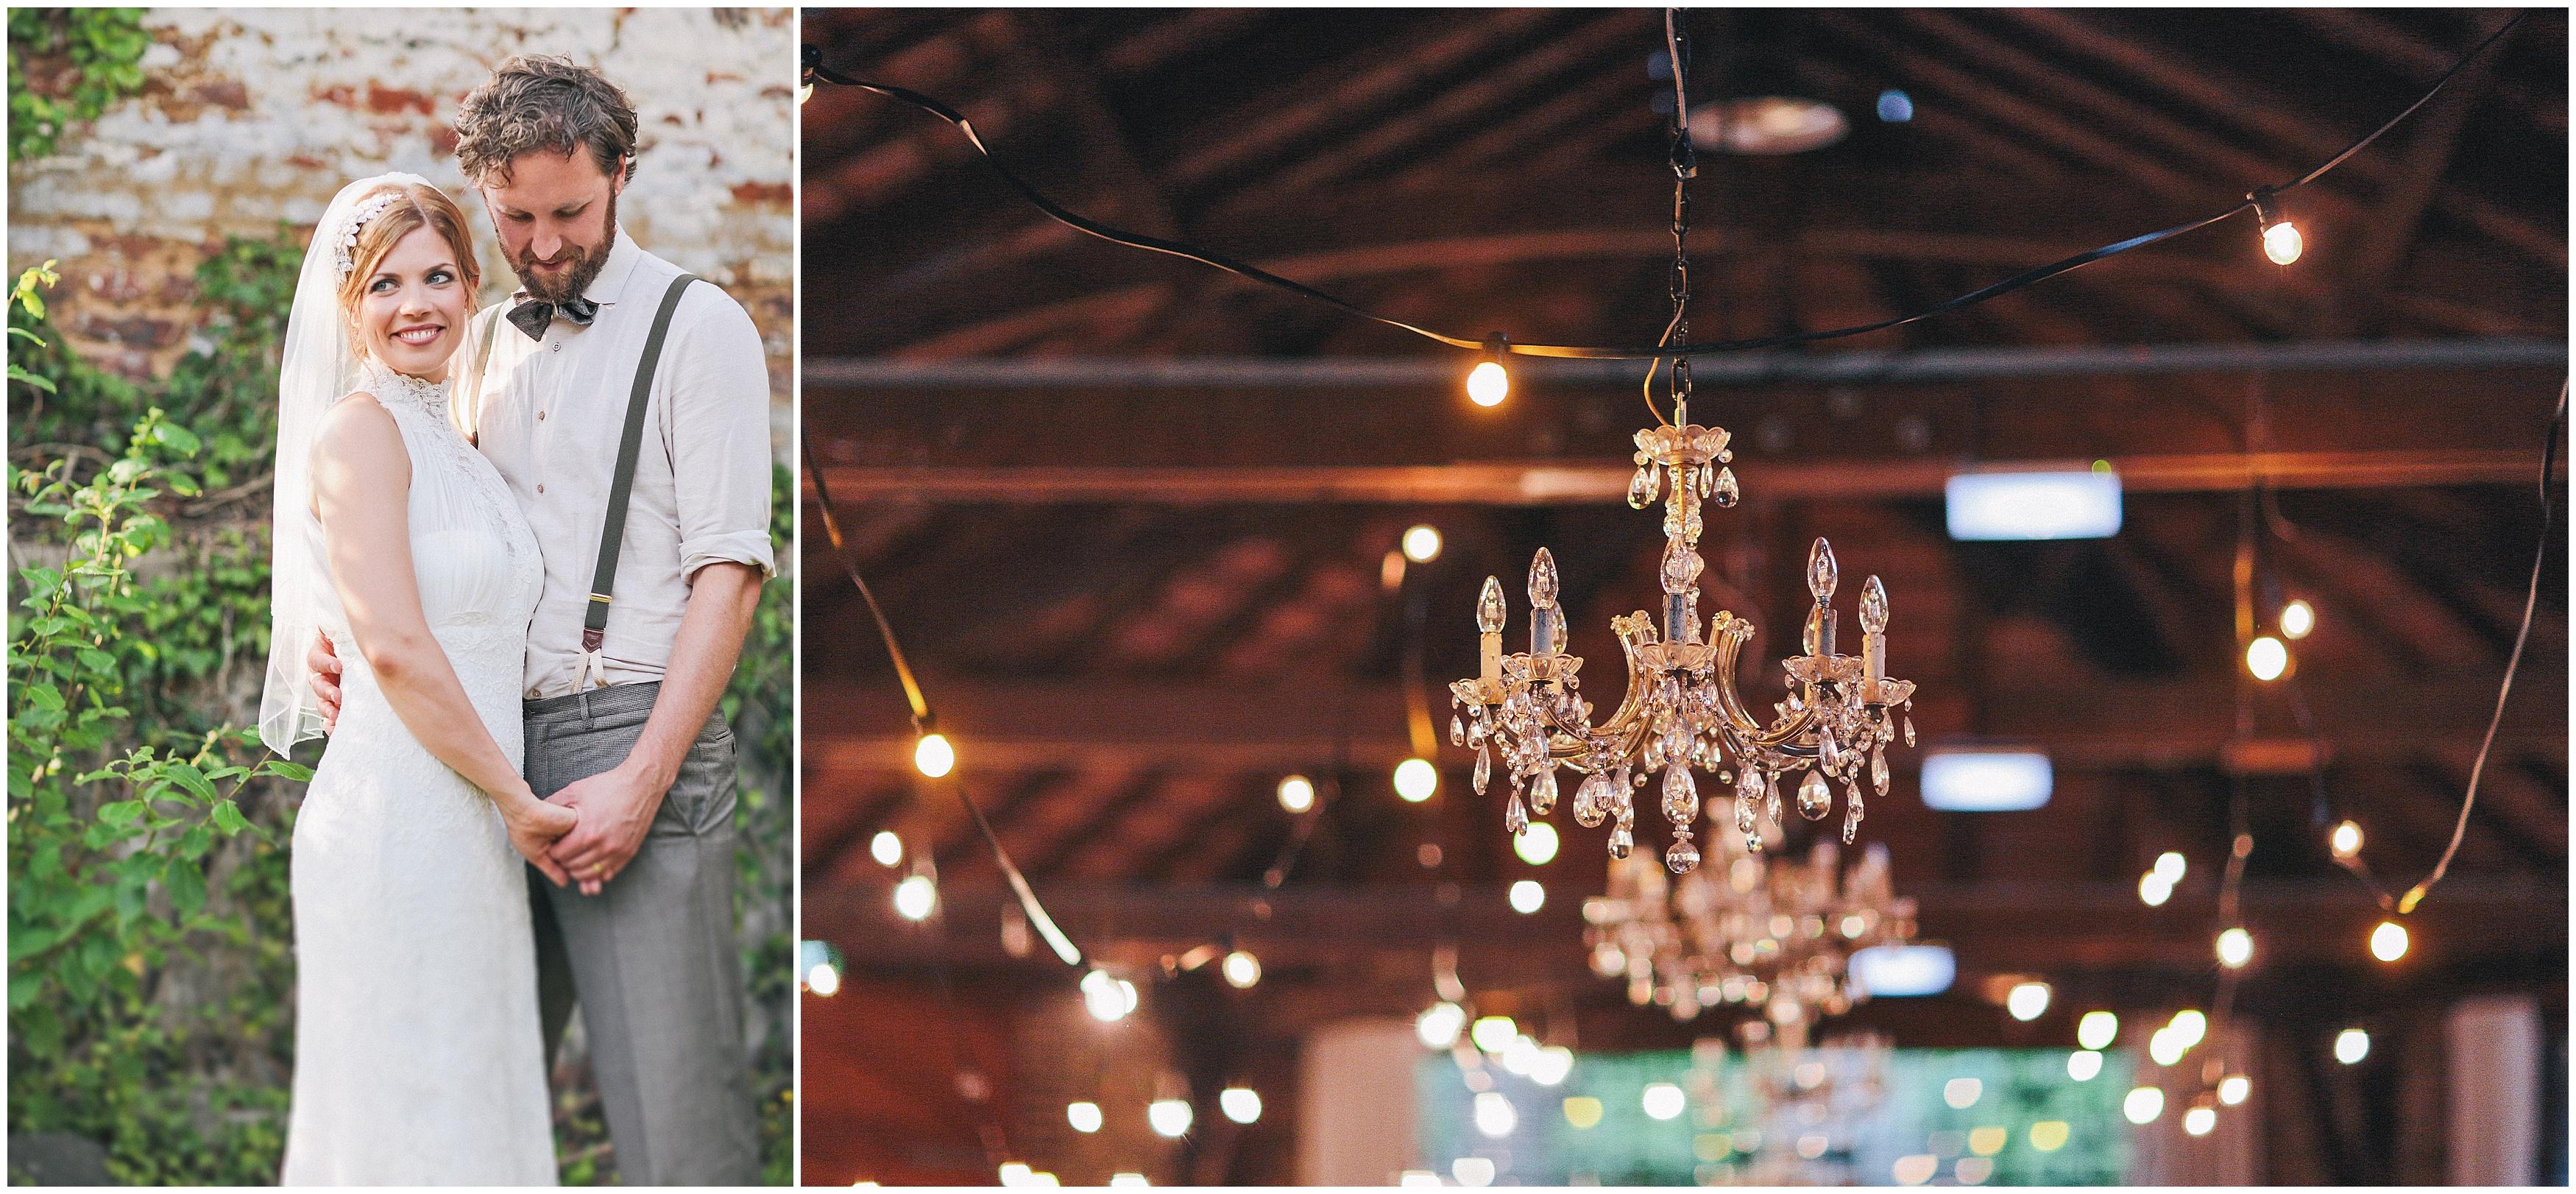 ivy&olive_Hochzeitsplanung_Nancy_Ebert_Fotografie_Vintage_Wedding_0025